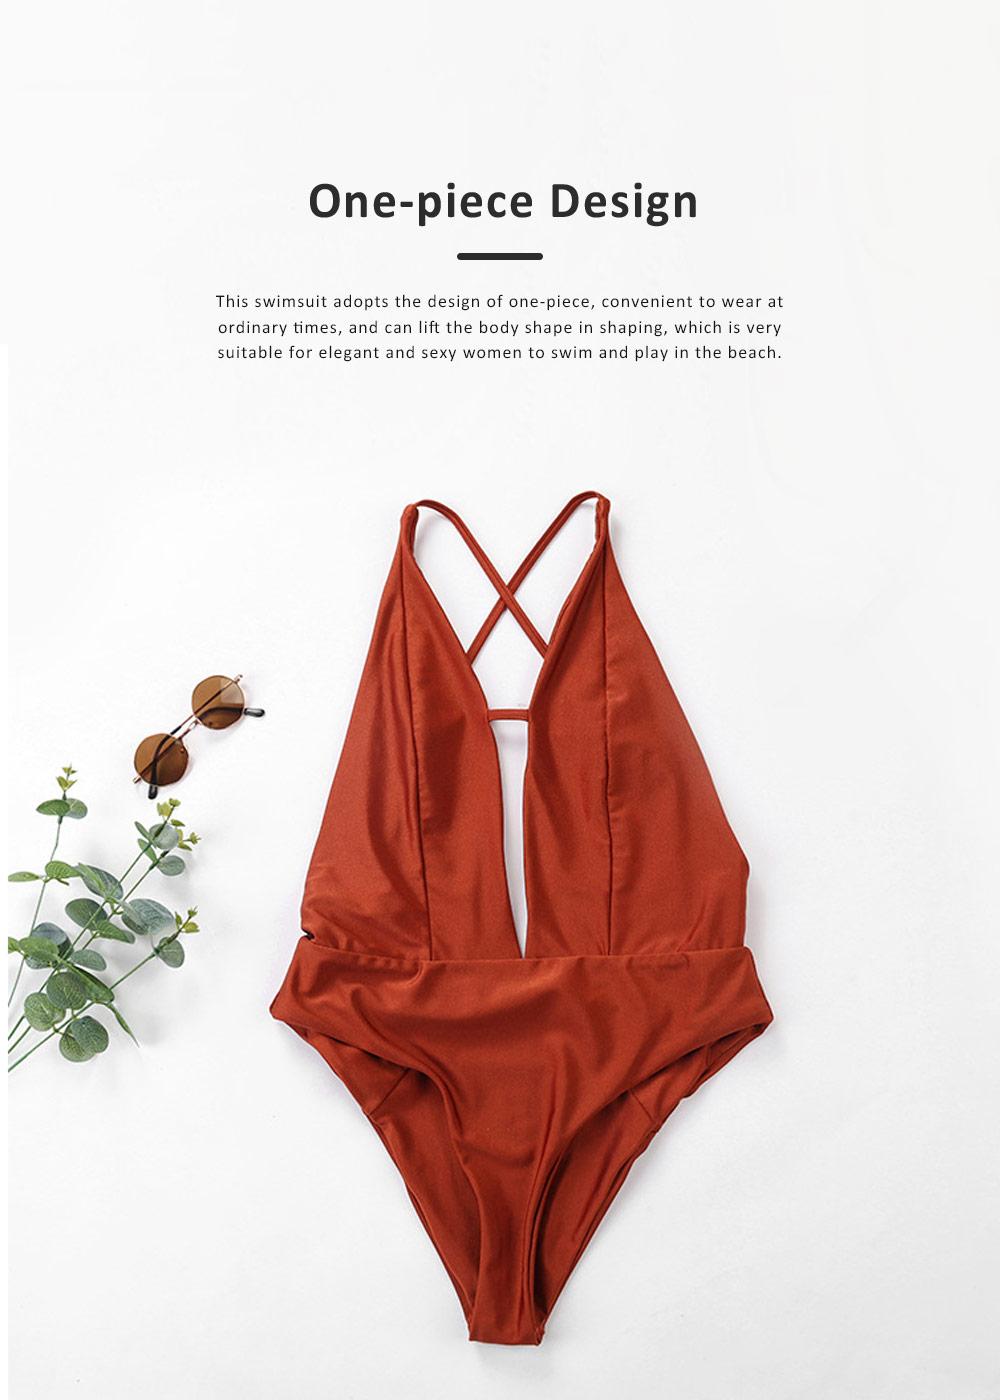 2019 Sexy Cross-strap Backless Bikini for Women , One-piece High Waist Swimwear Adjustable Shoulder Strap Backless Swimming Suit Bikini Red 2